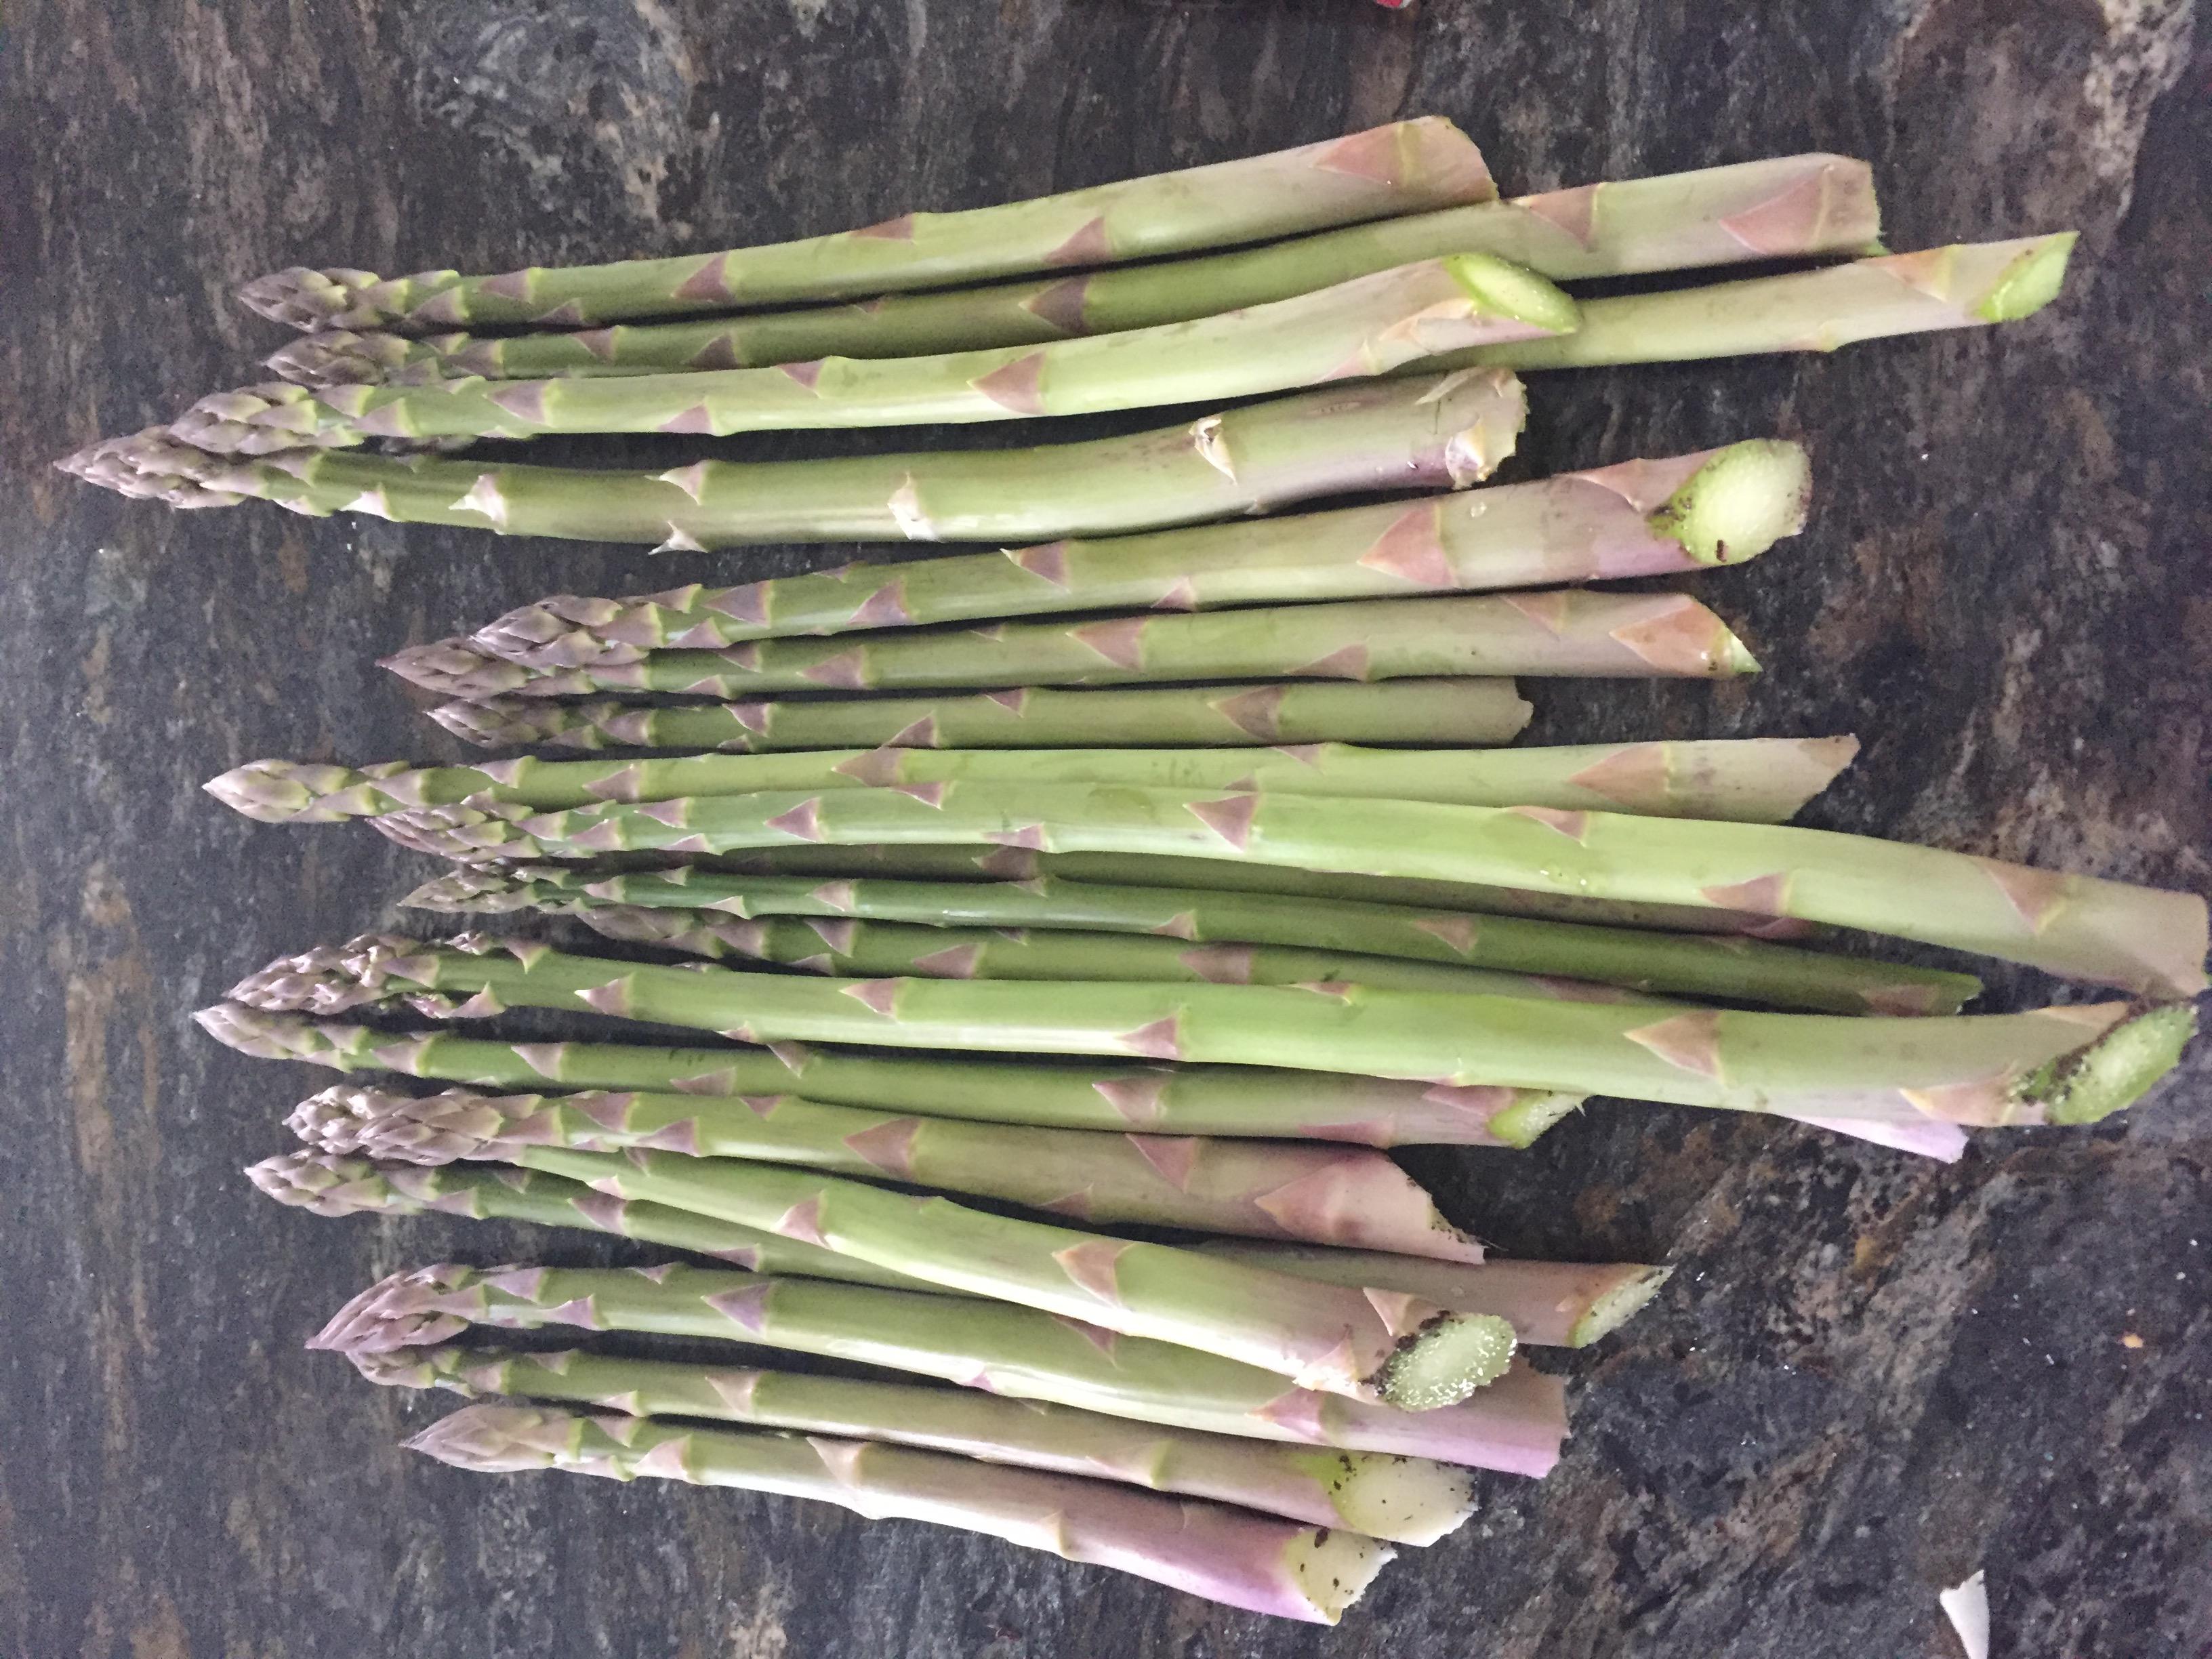 6EA19E63 9A37 4633 869D 60E4D8CB44BD Asparagus and Microgreens